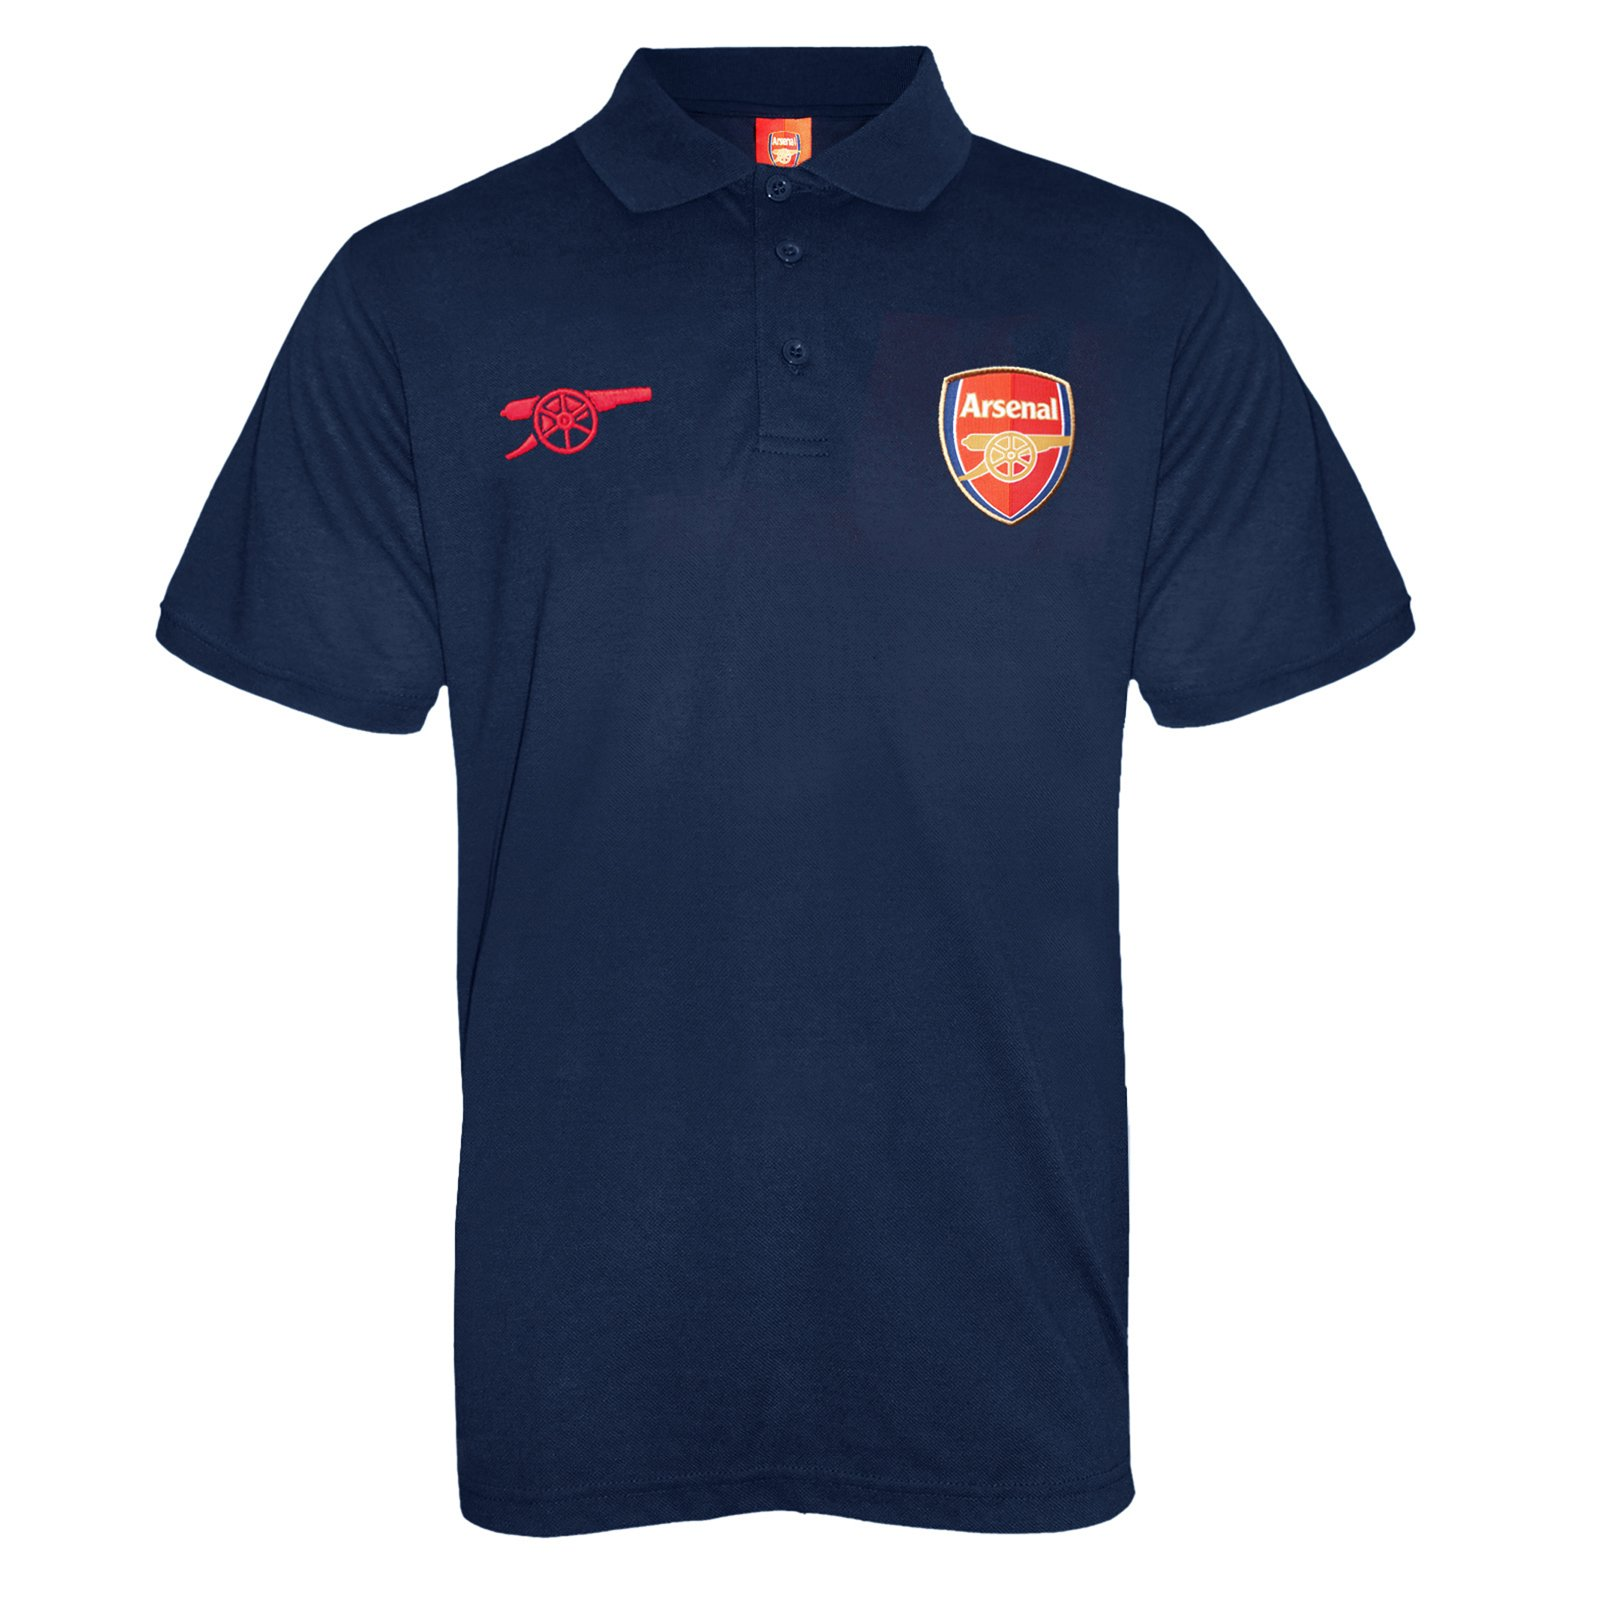 Arsenal Football Club Official Soccer Gift Mens Crest Polo Shirt Navy Blue Med